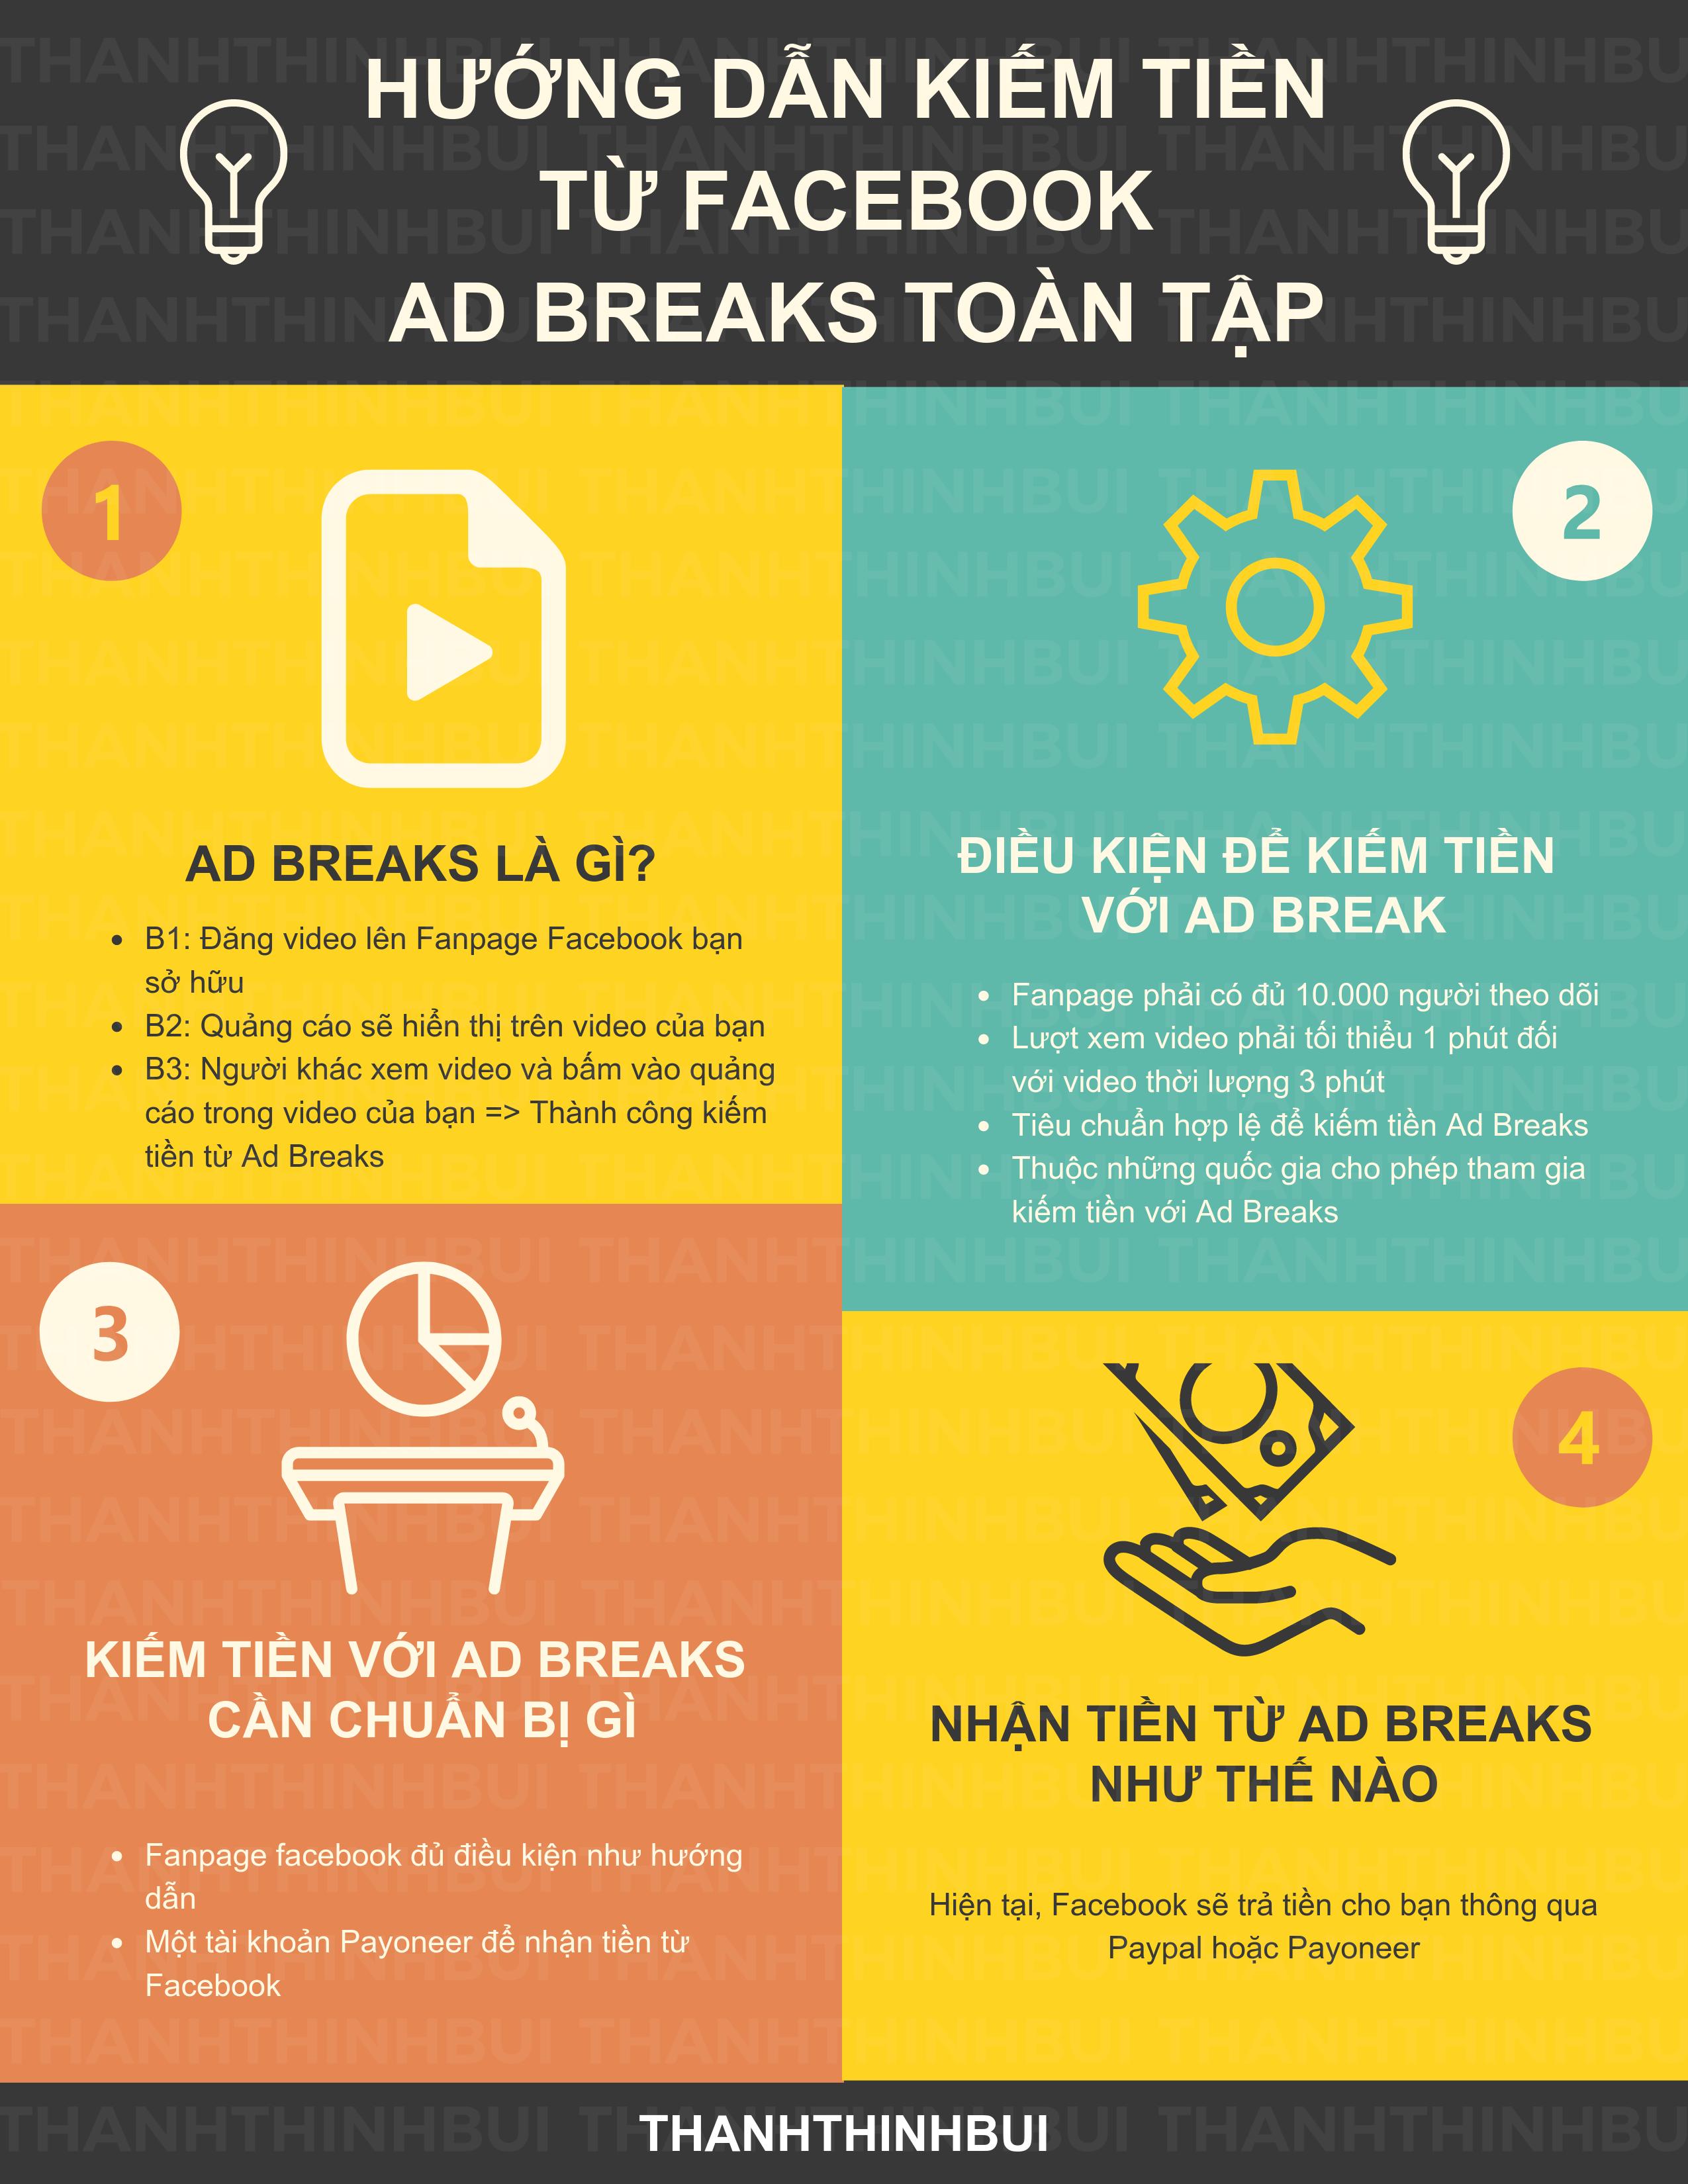 huong-dan-kiem-tien-tu-facebook-ad-breaks-toan-tap